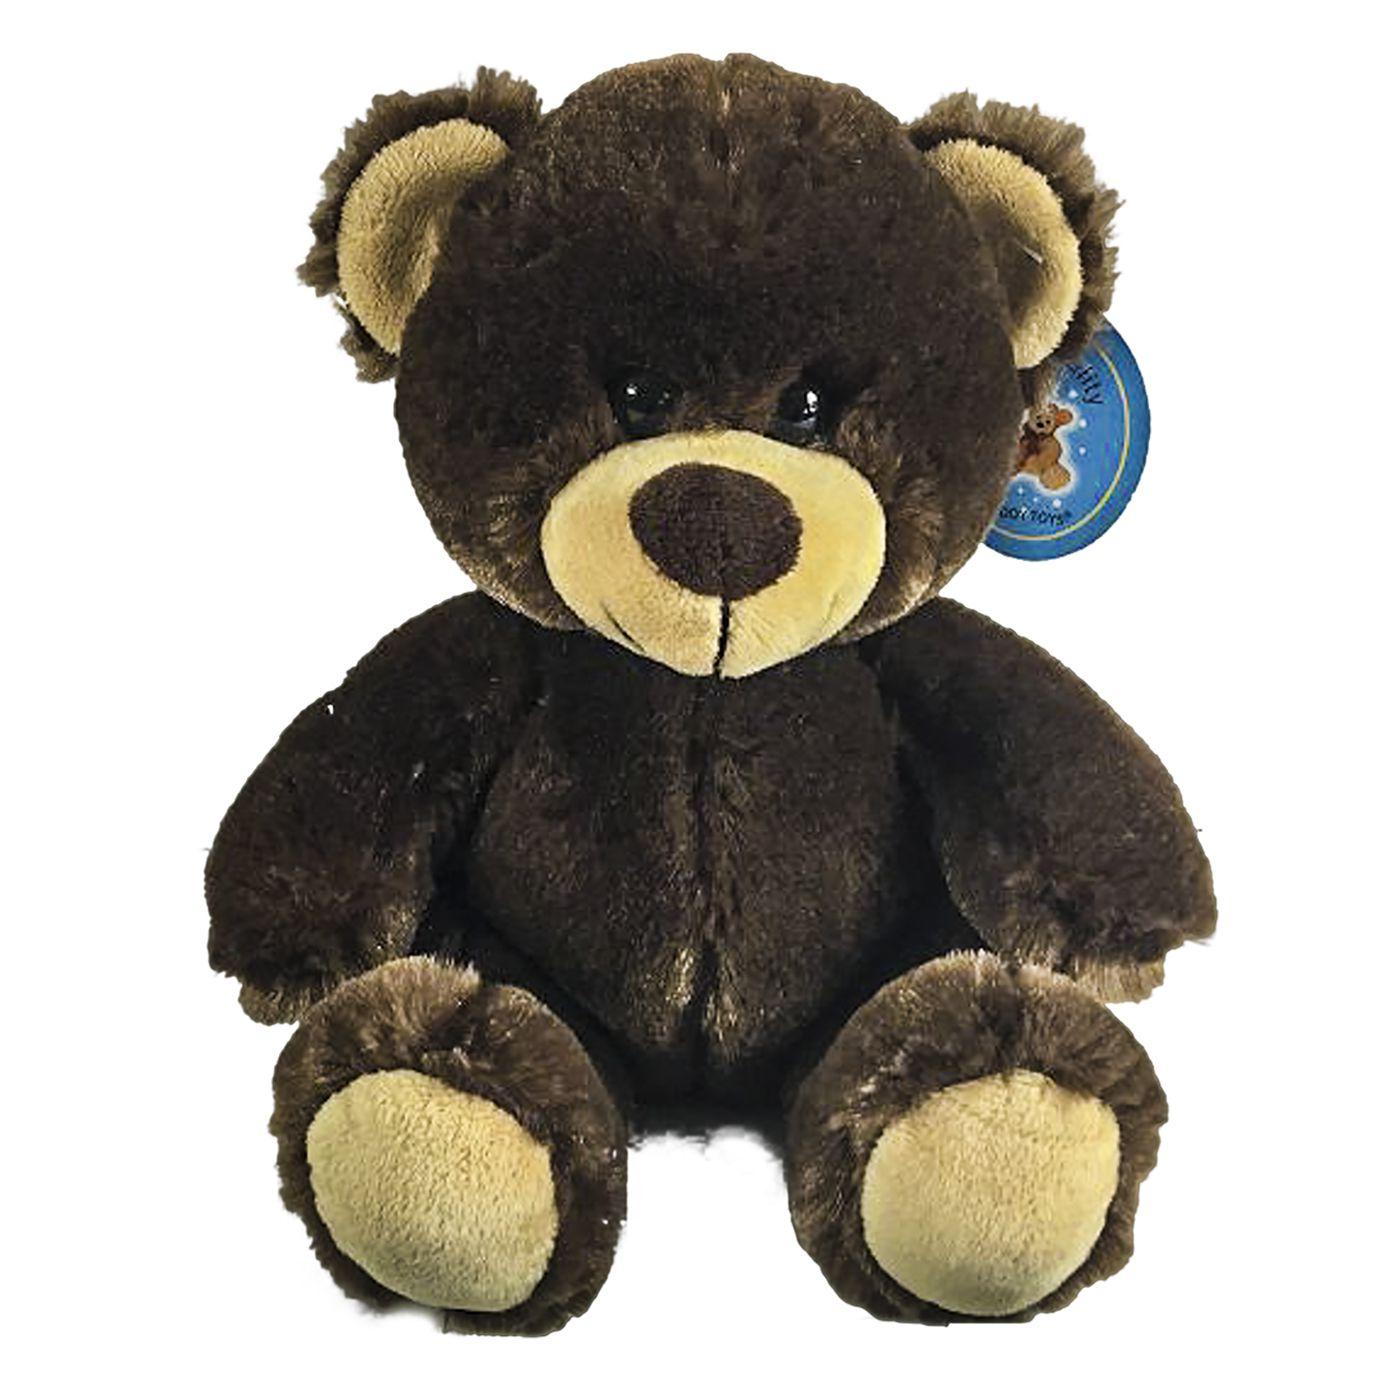 e75aa80ab7 online αγορές λουτρινα αρκουδακια γιγας παιχνίδια λούτρινα